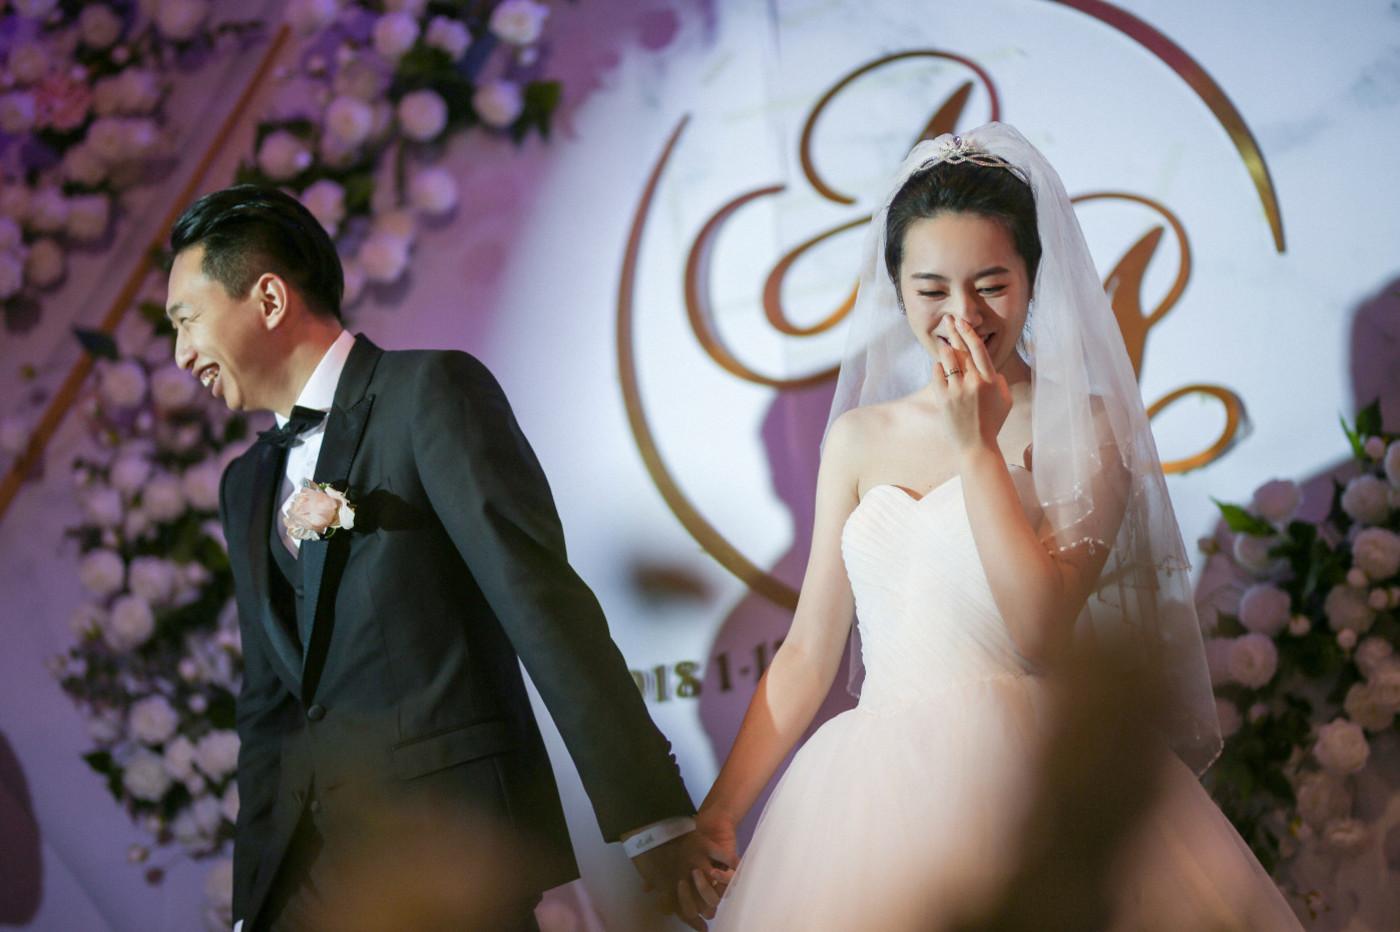 【KAI 婚礼纪实】Z&Y 常州婚礼31